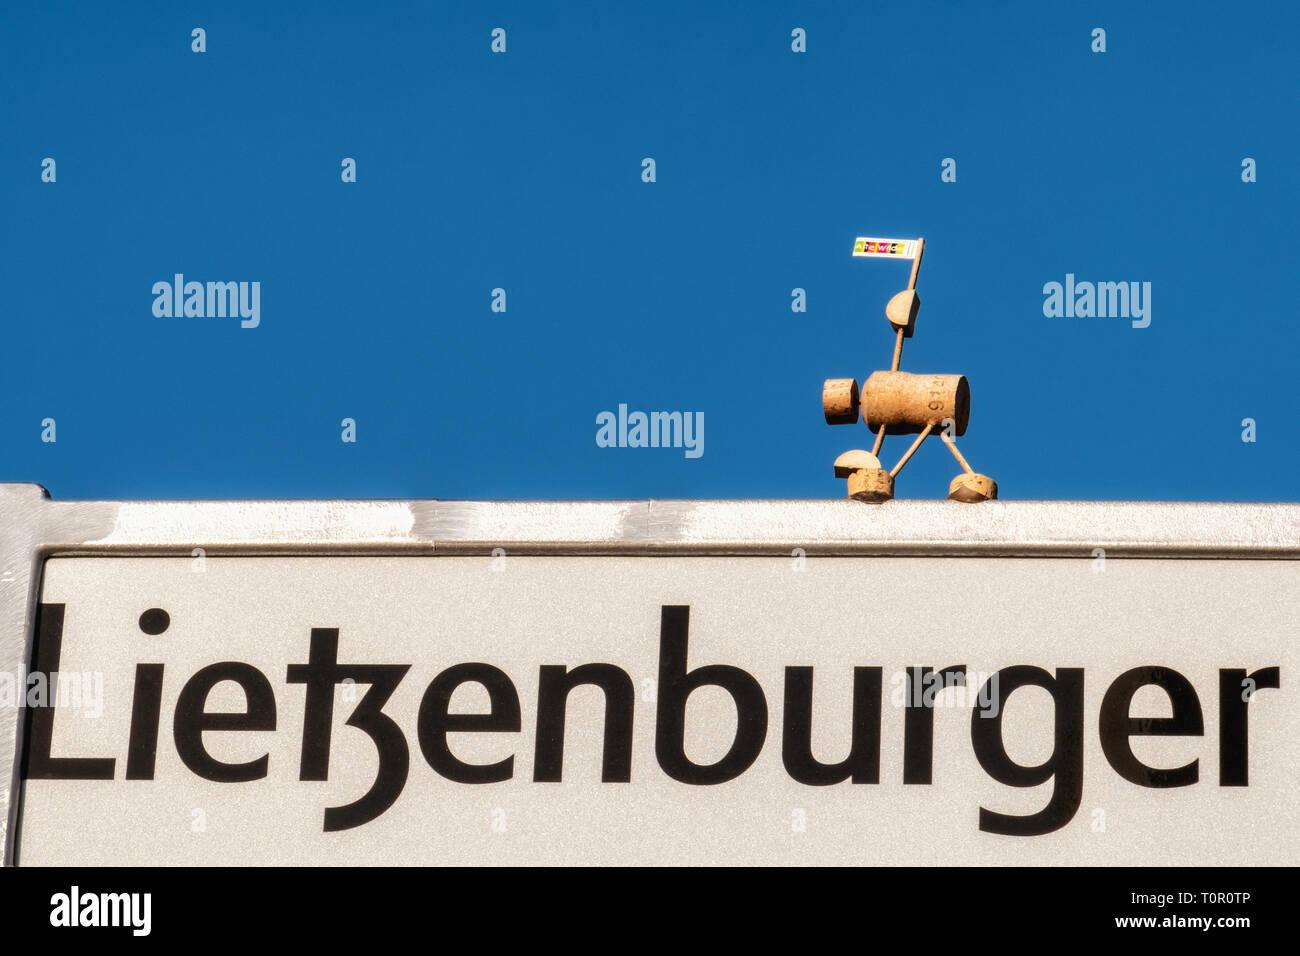 Berlin-Wilmersdorf. Lietzenburger street sign, Road sign with miniature Cork Yogi - Stock Image